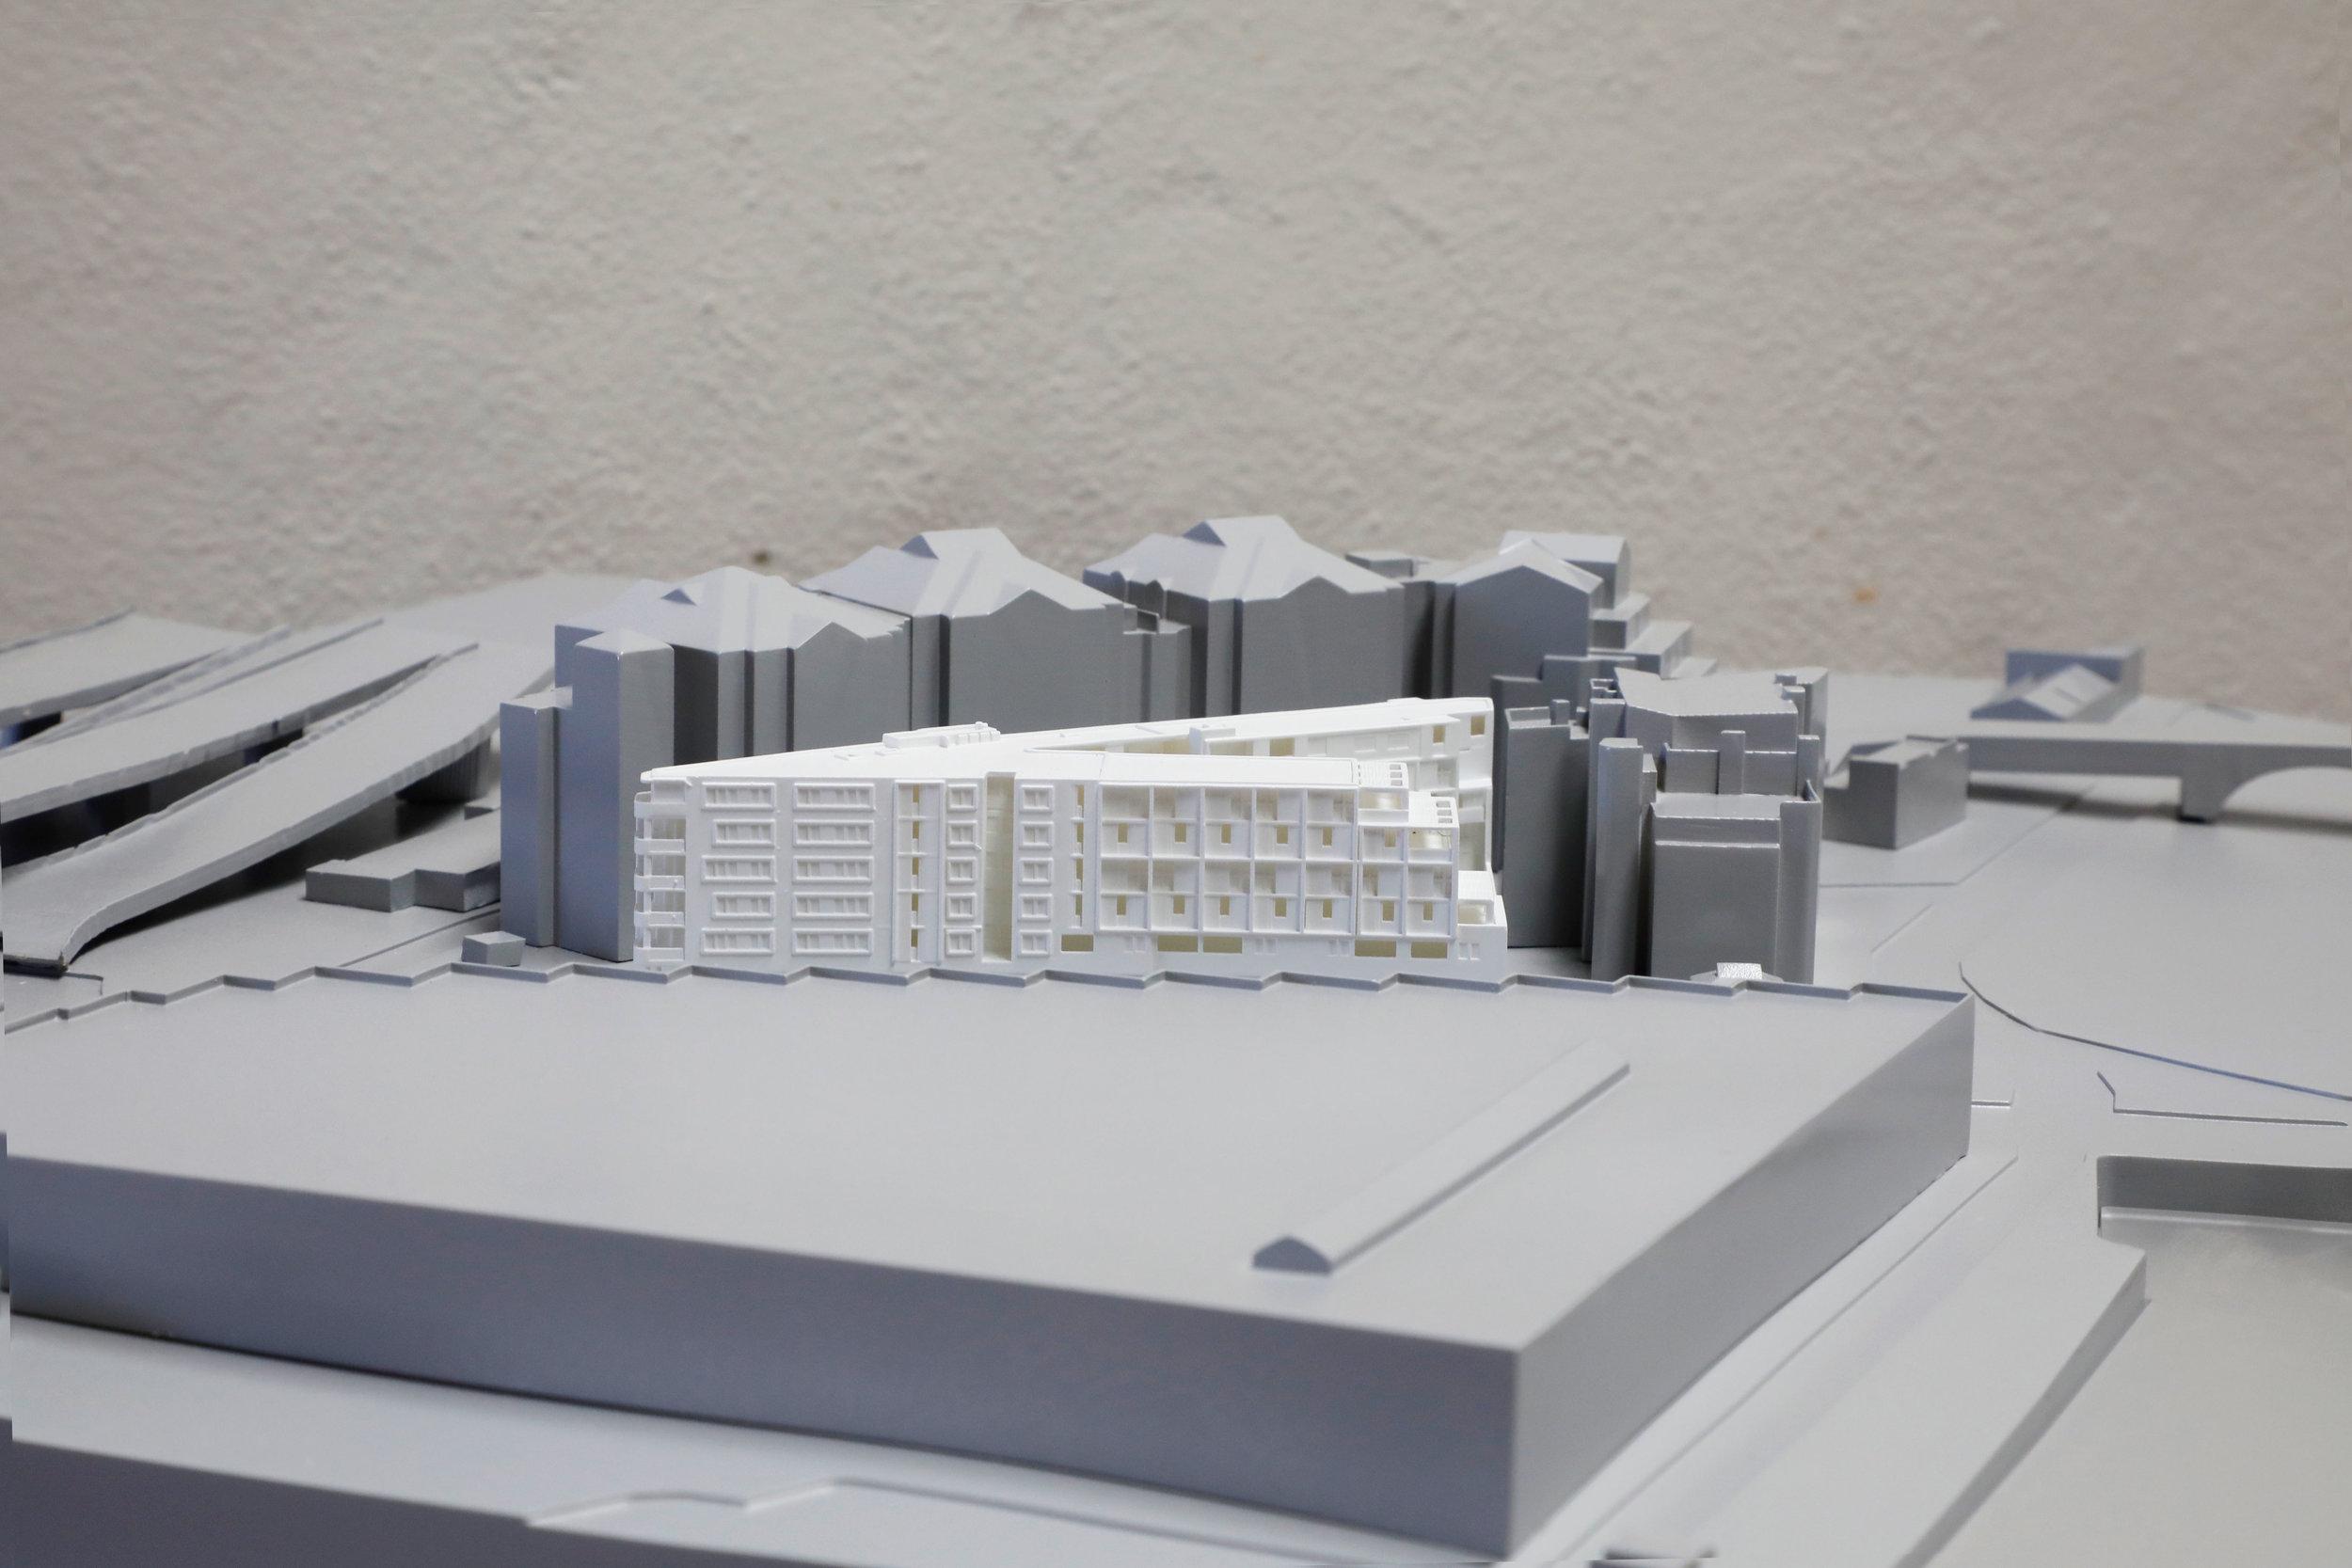 DA Model City Of Sydney Council 1:500